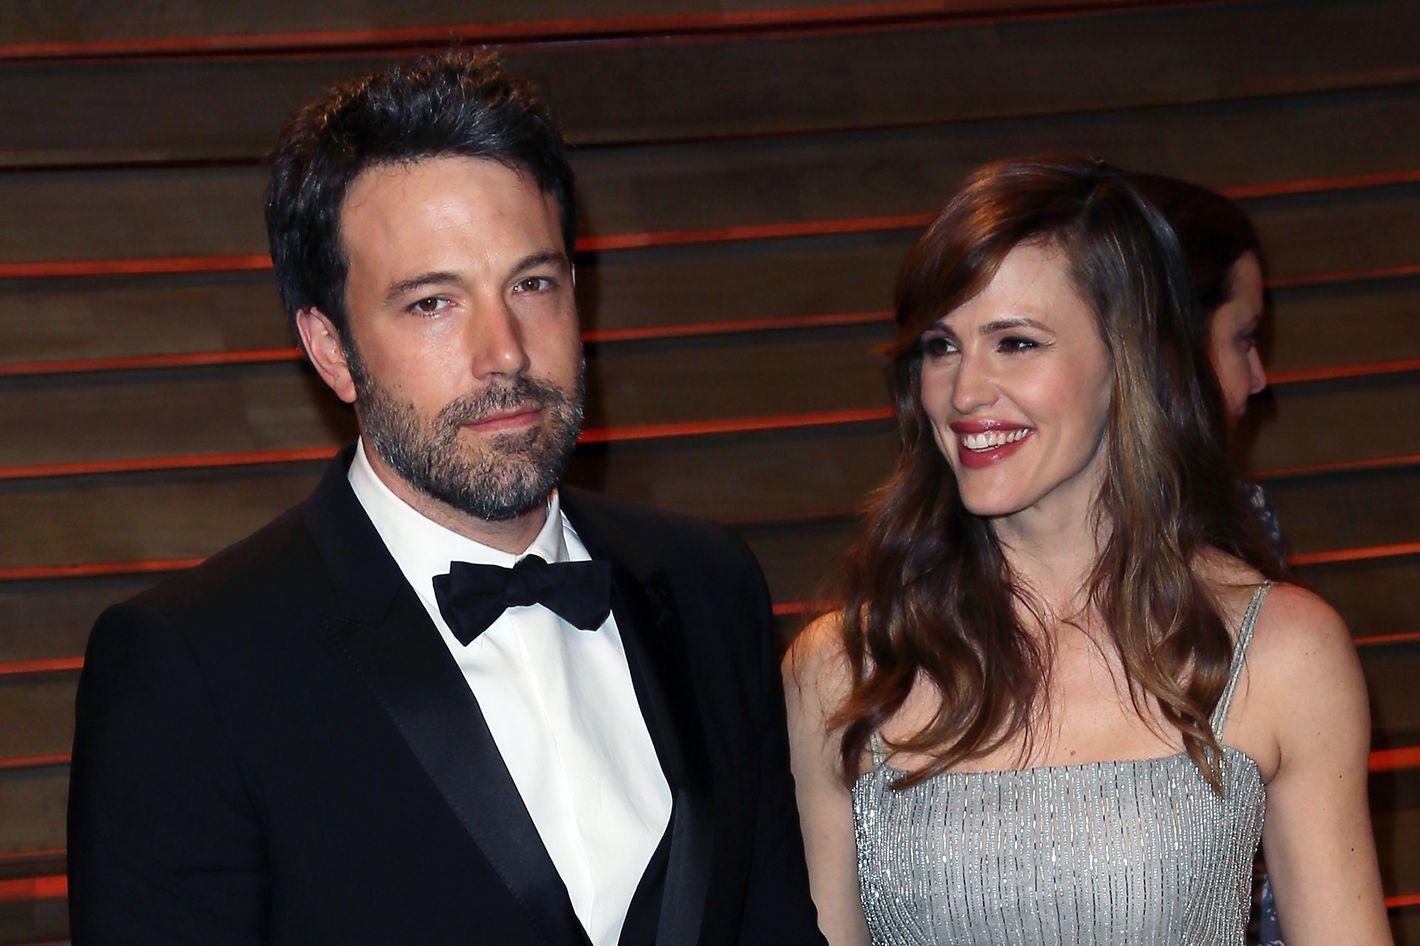 Sci fi fans dating after divorce